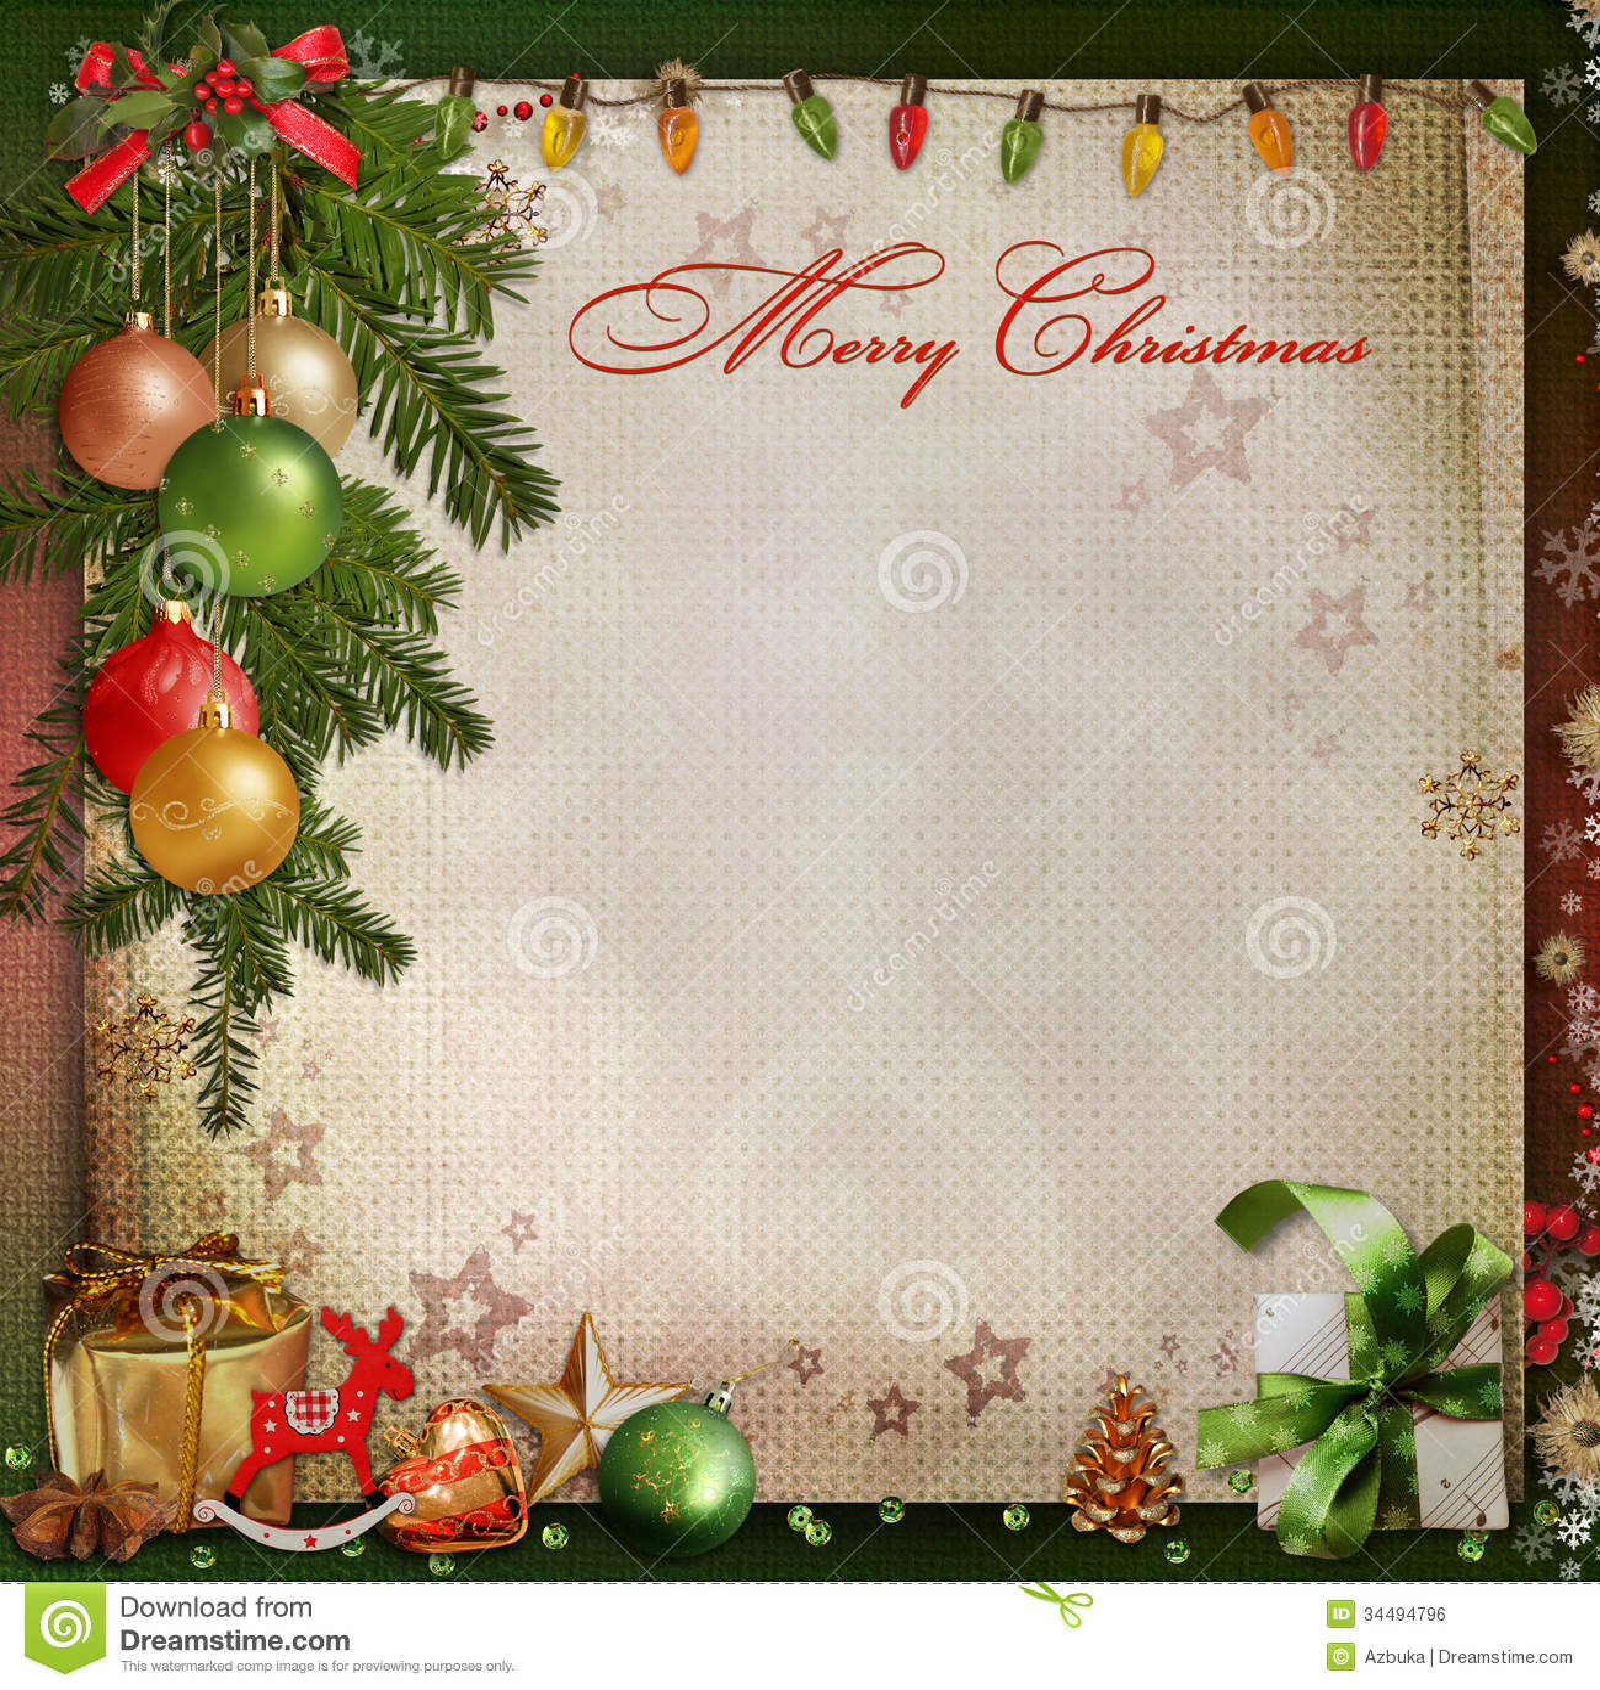 #B1201A Christmas Decoration On A Vintage Background Royalty Free  5535 décorations de noel vintage 1300x1390 px @ aertt.com